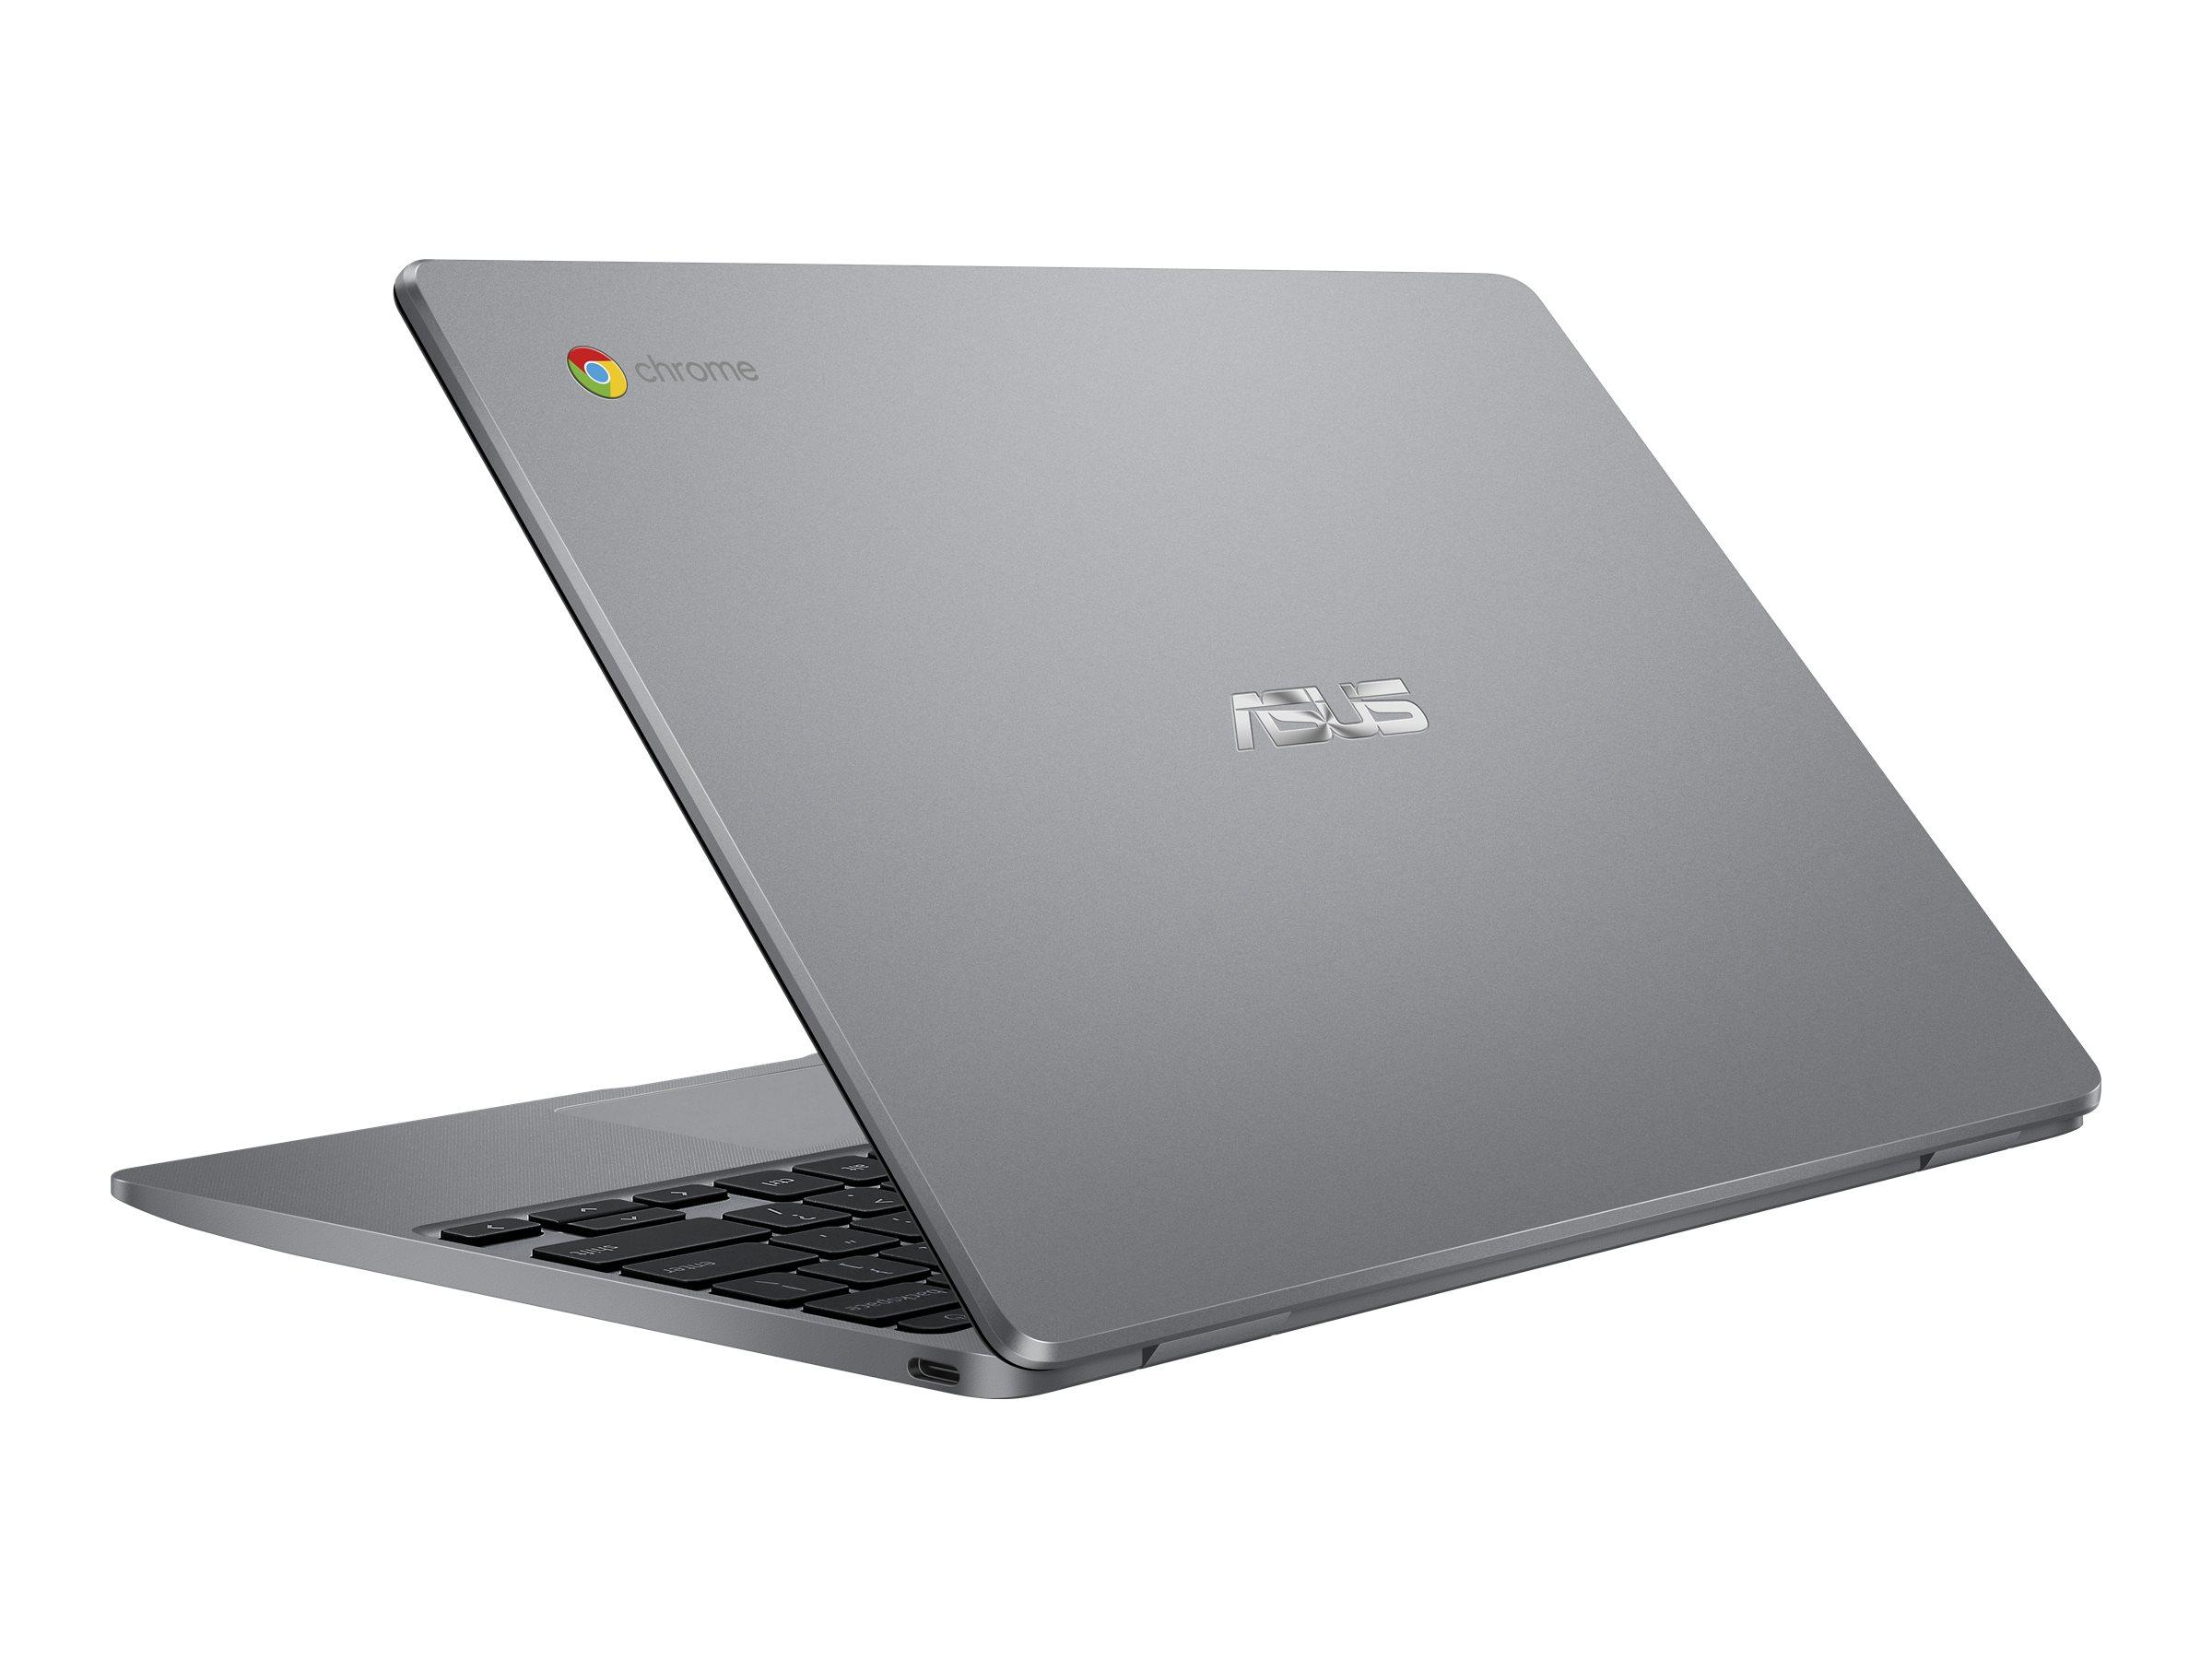 ASUS Chromebook 12 C223NA-DH02 - 11.6